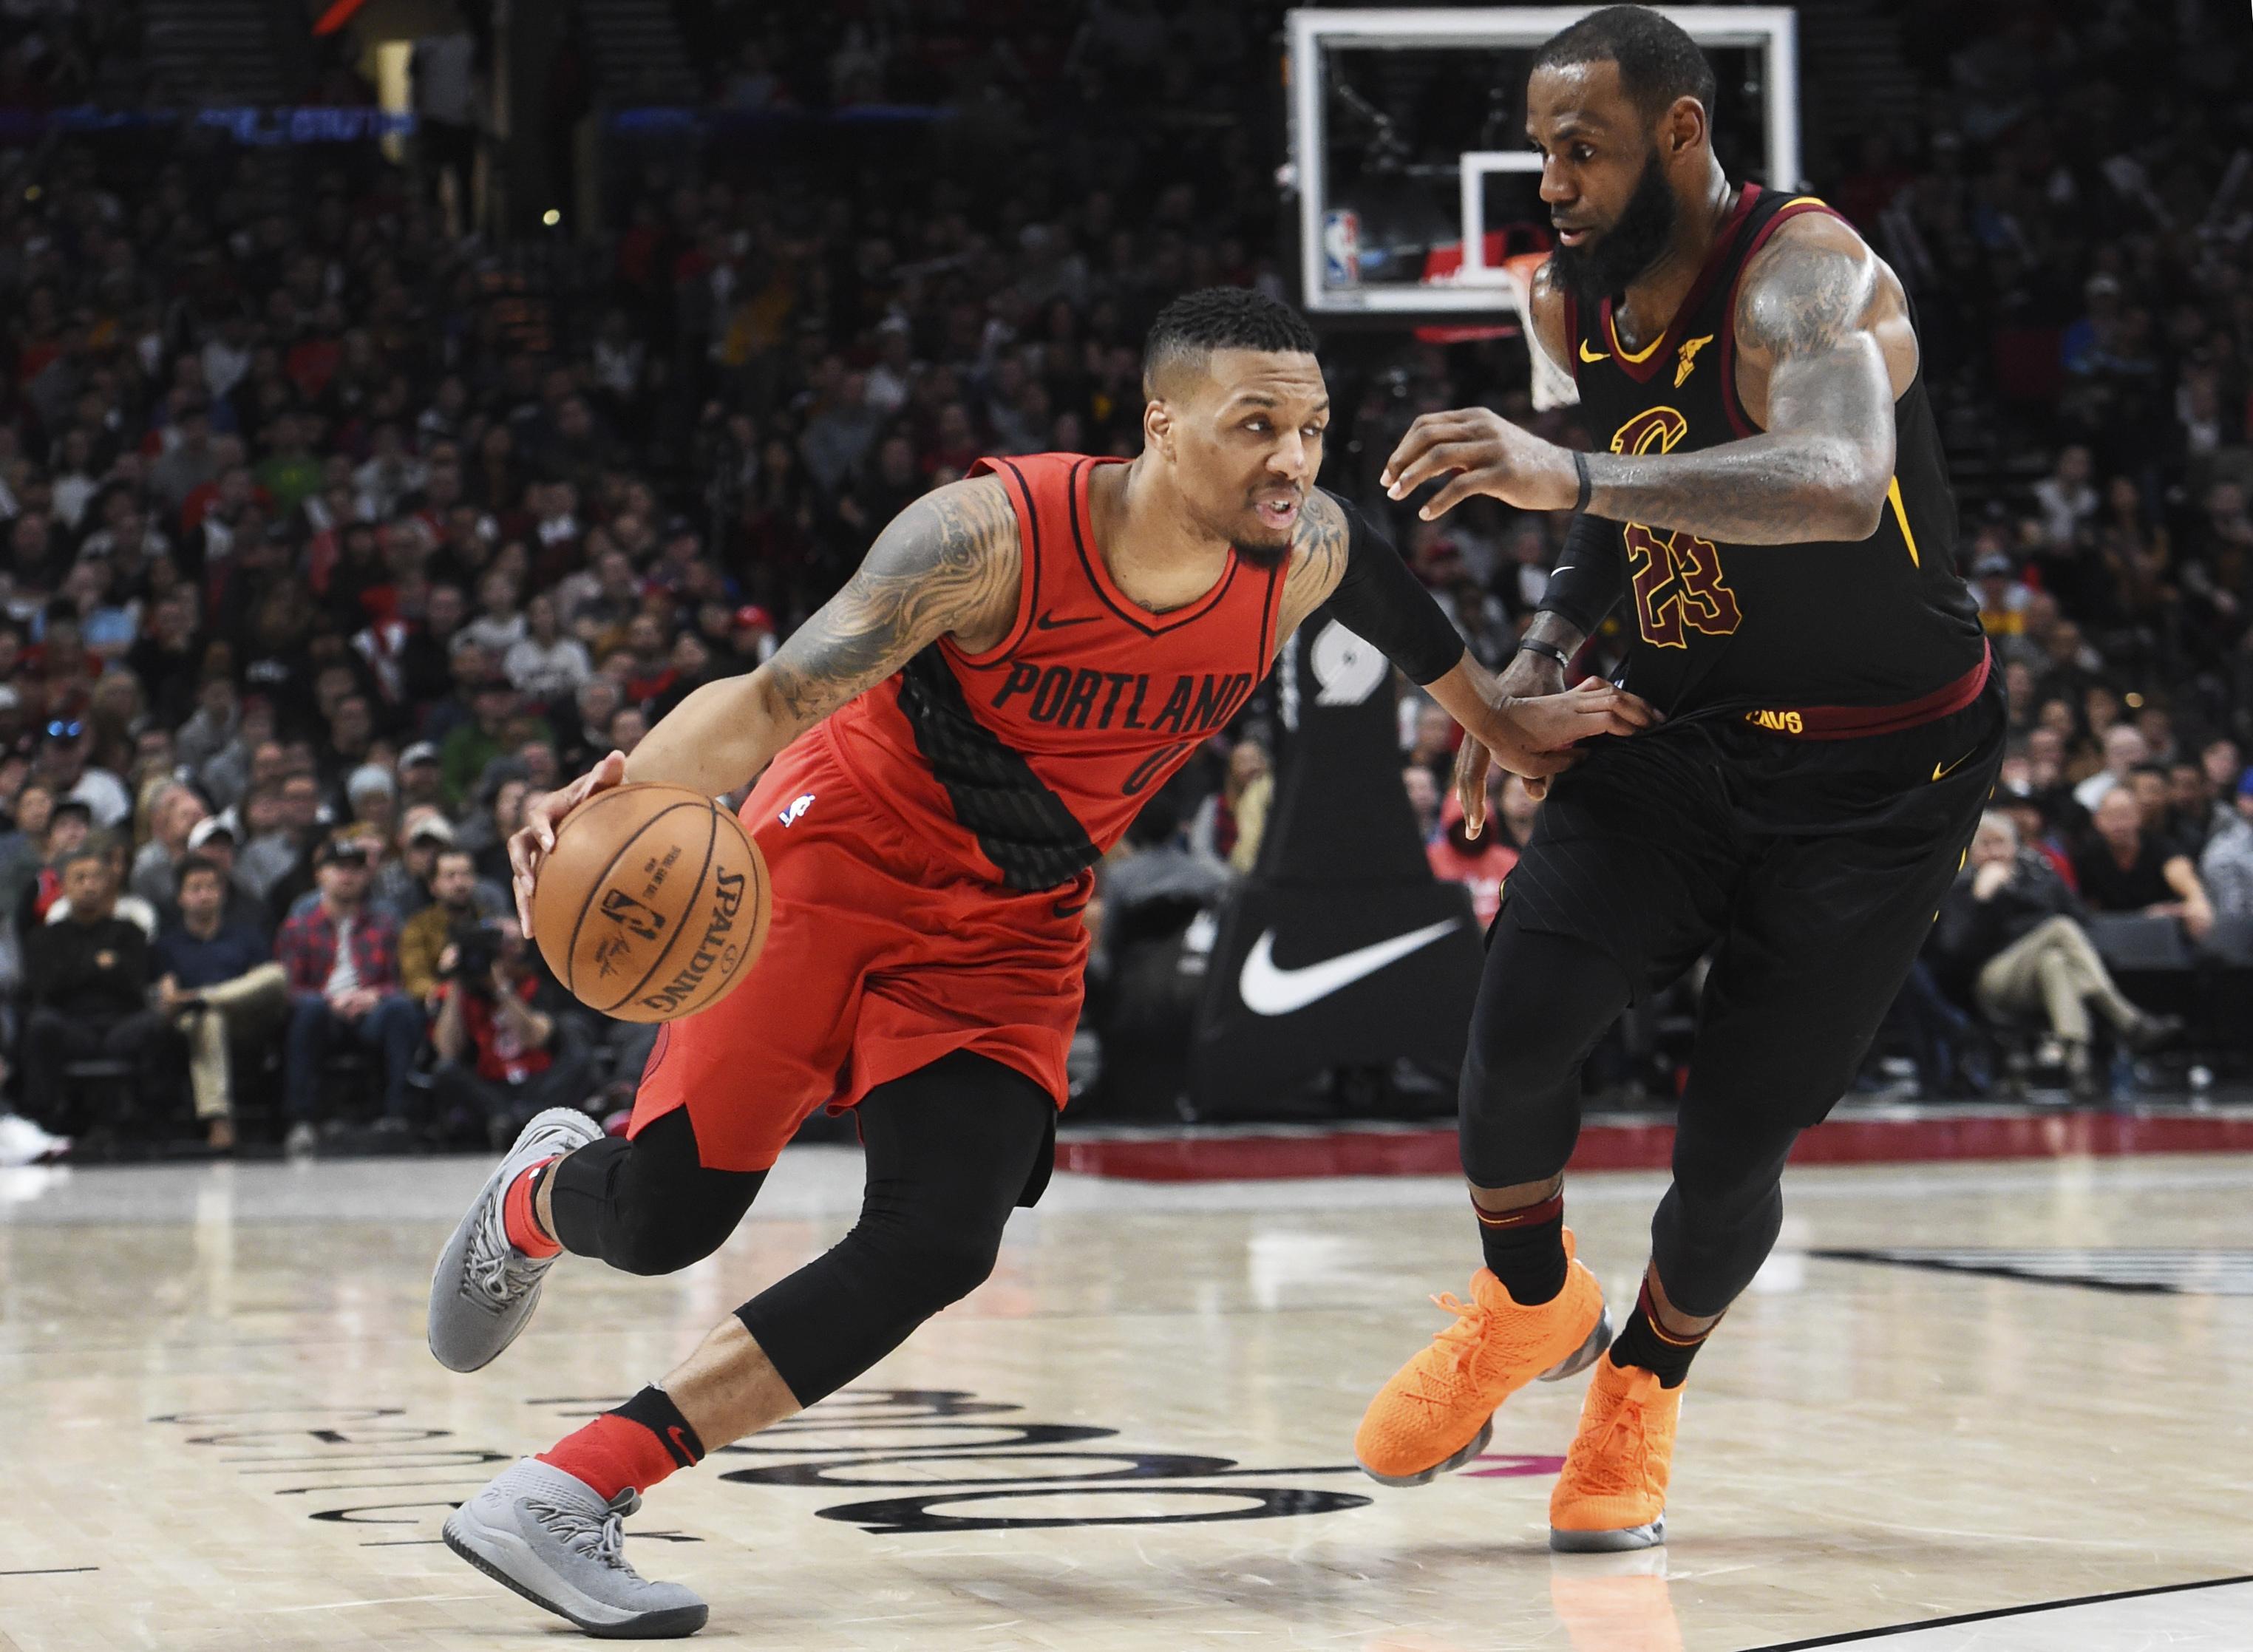 Portland Trail Blazers guard Damian Lillard drives to the basket past  Cleveland Cavaliers forward LeBron James 6c6514f95c